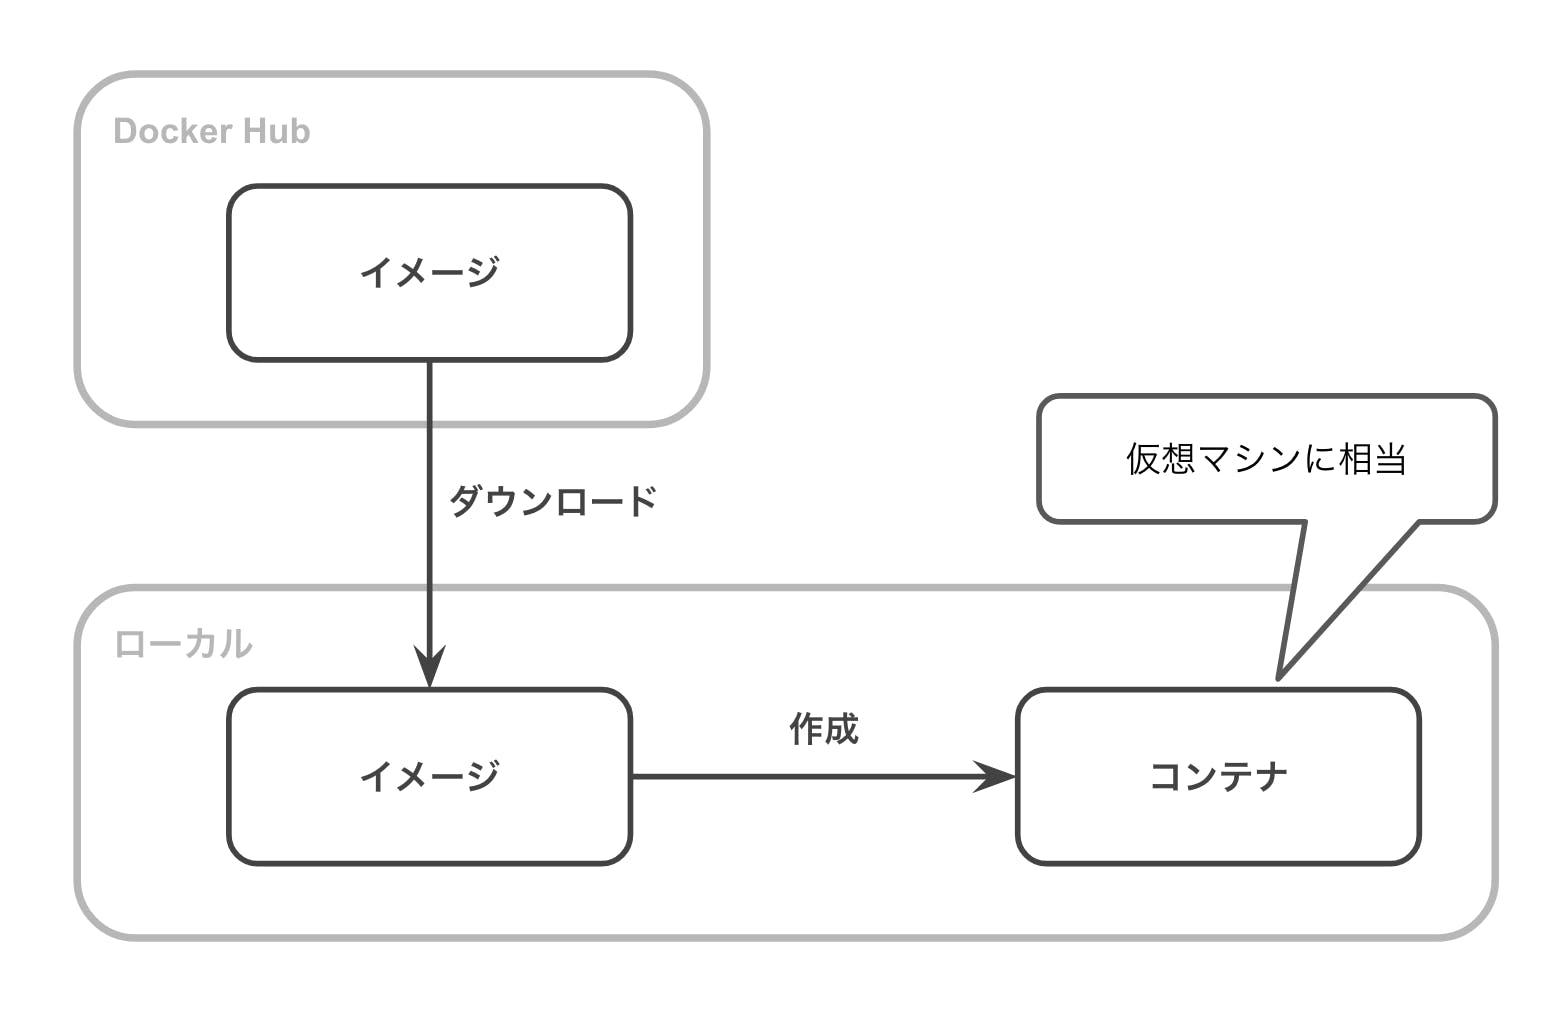 Dockerの主な機能